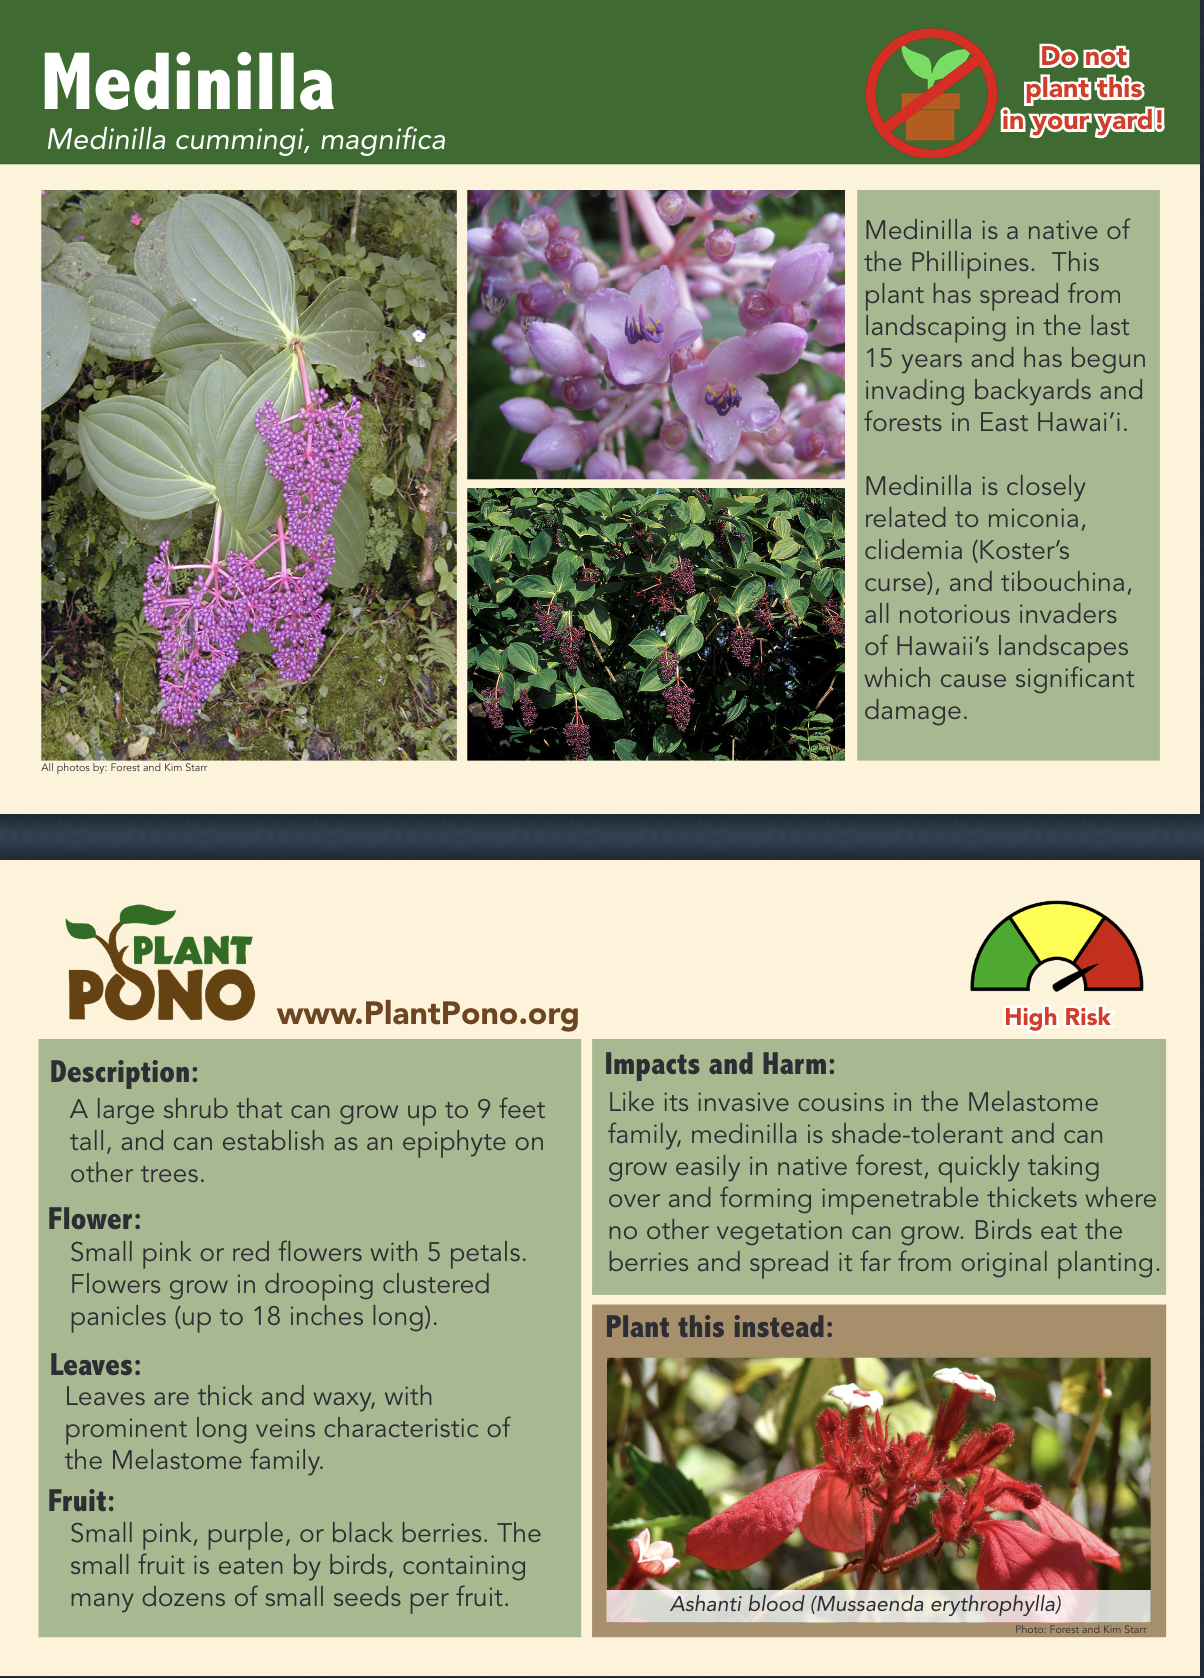 High-risk Melastomataceae (Medinilla)